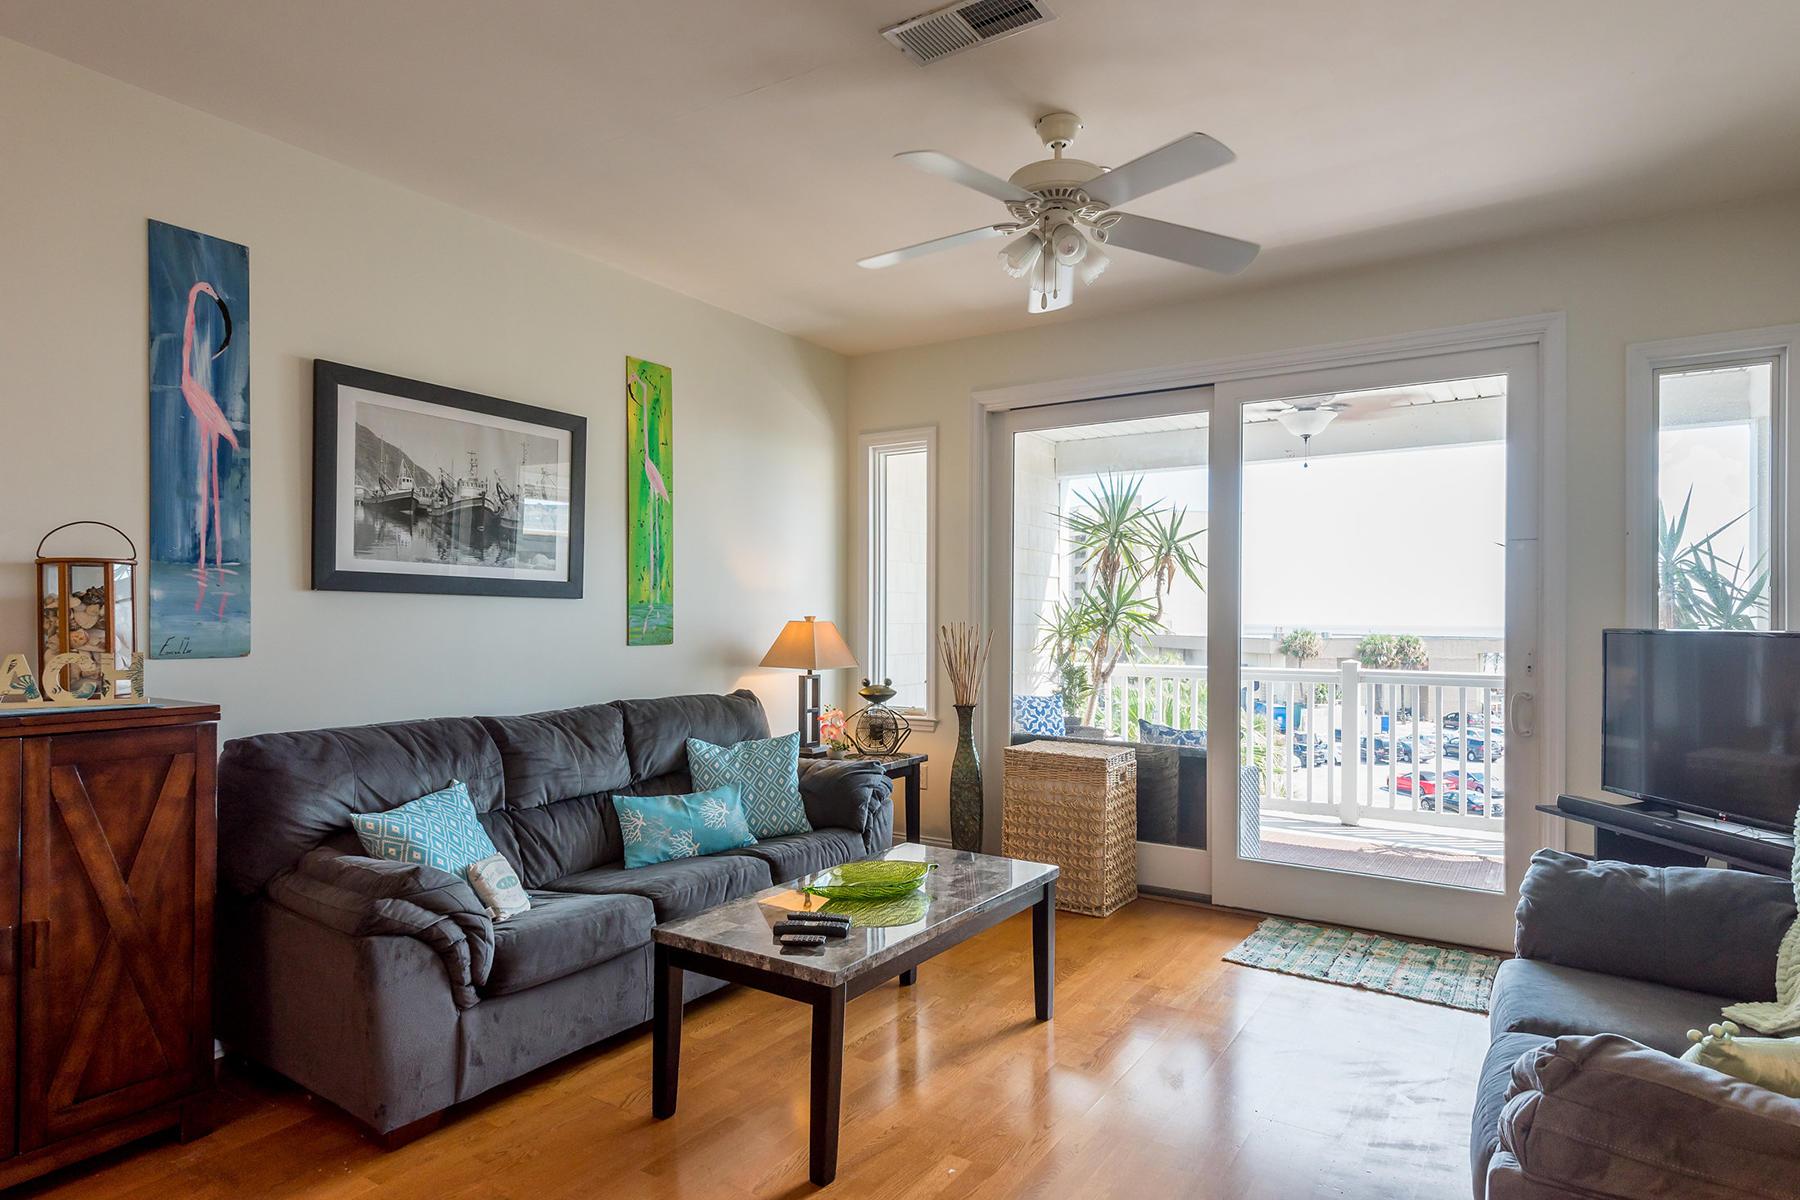 Pier Pointe Villas Homes For Sale - 114 Ashley, Folly Beach, SC - 29